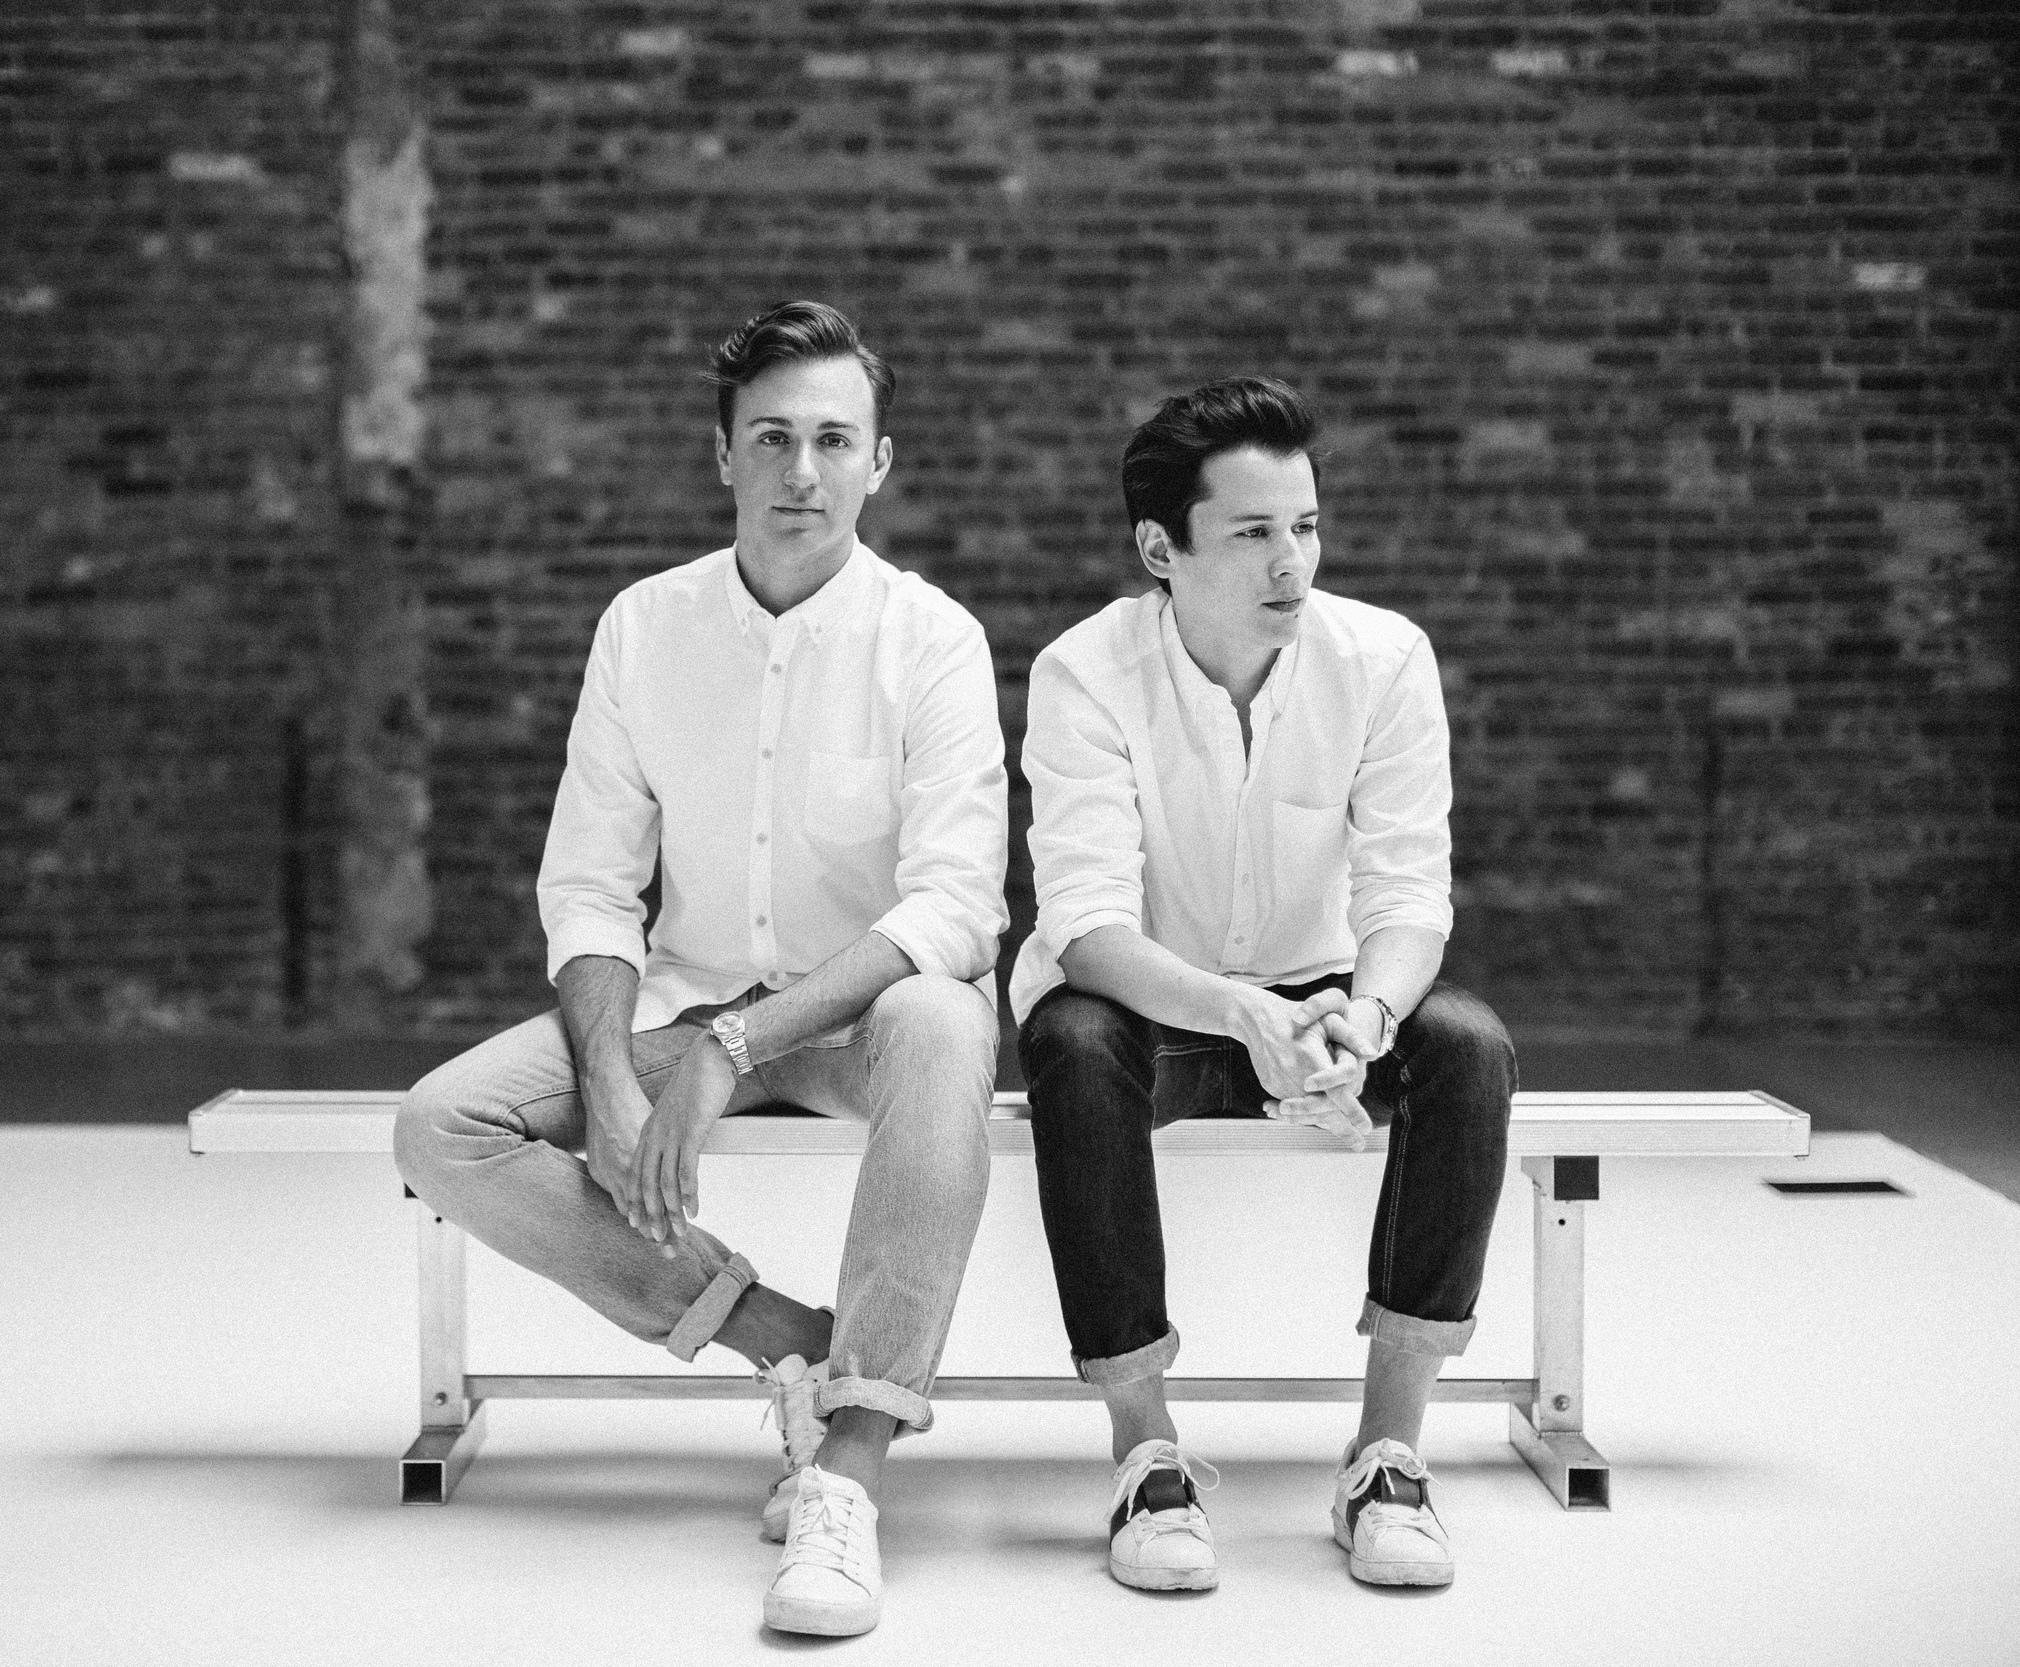 Luigi Tadini and Nicky Balestrieri, founders of The Gathery